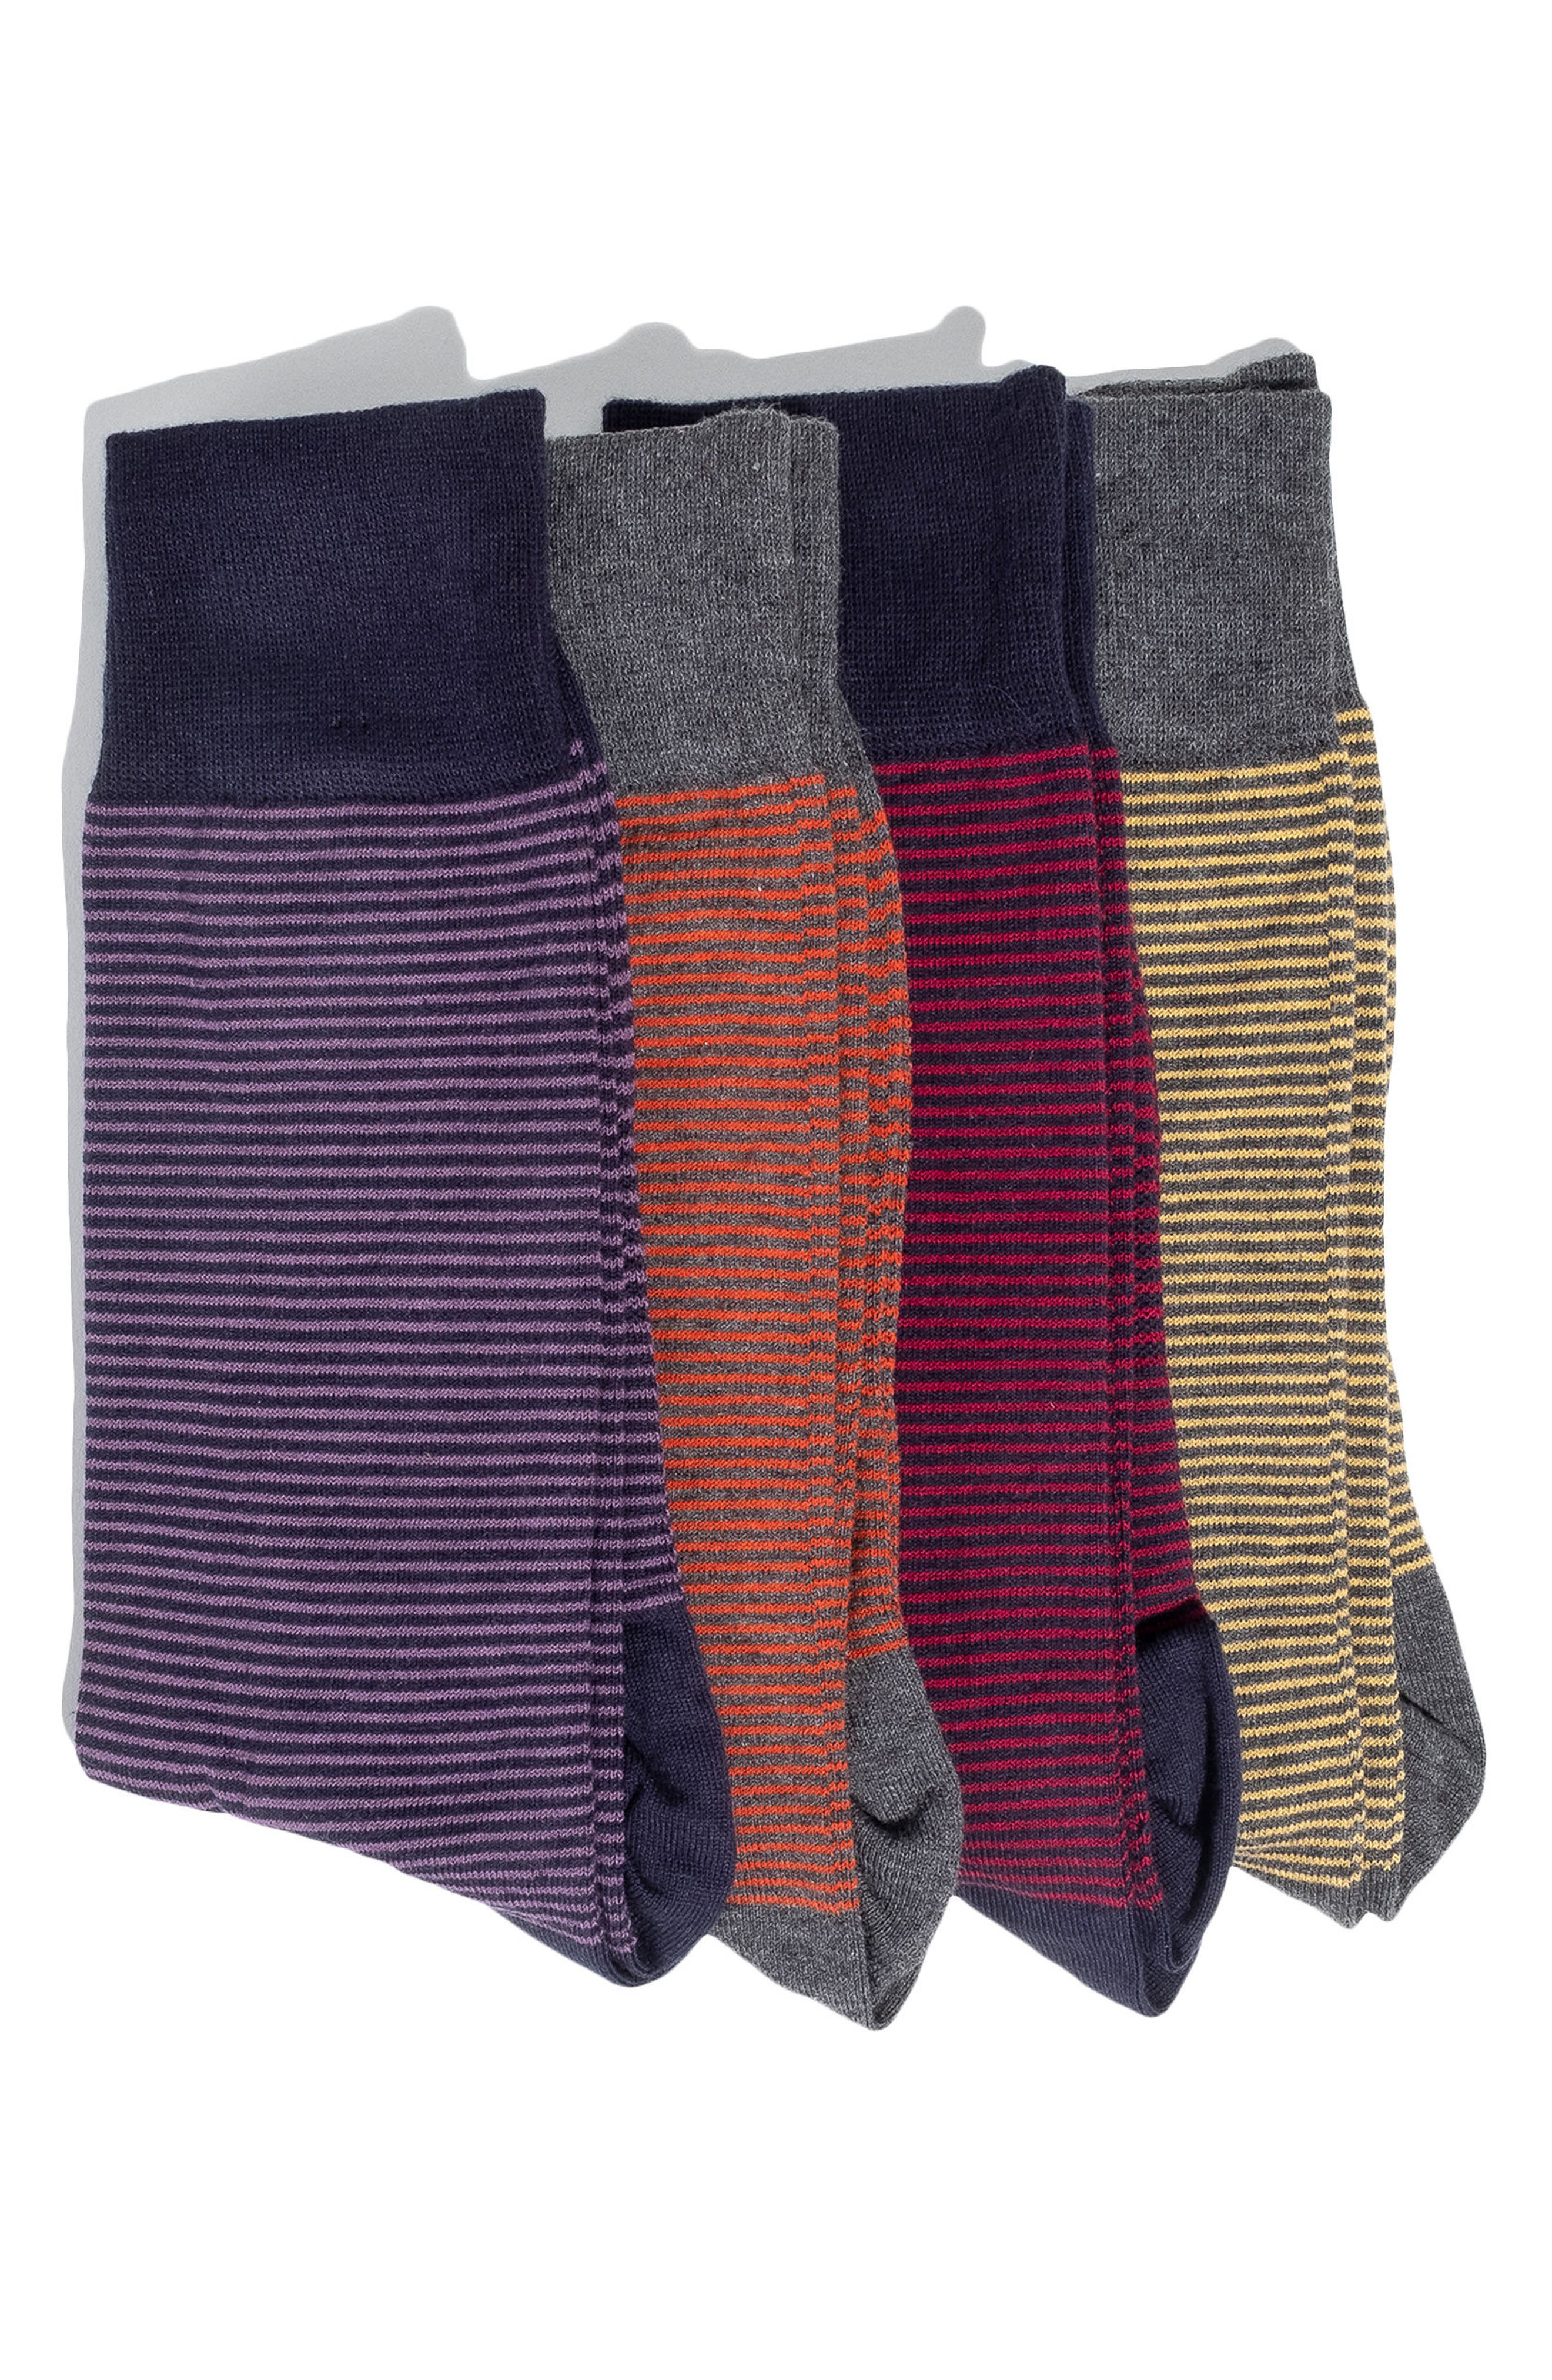 4-Pack Socks,                             Main thumbnail 1, color,                             RED